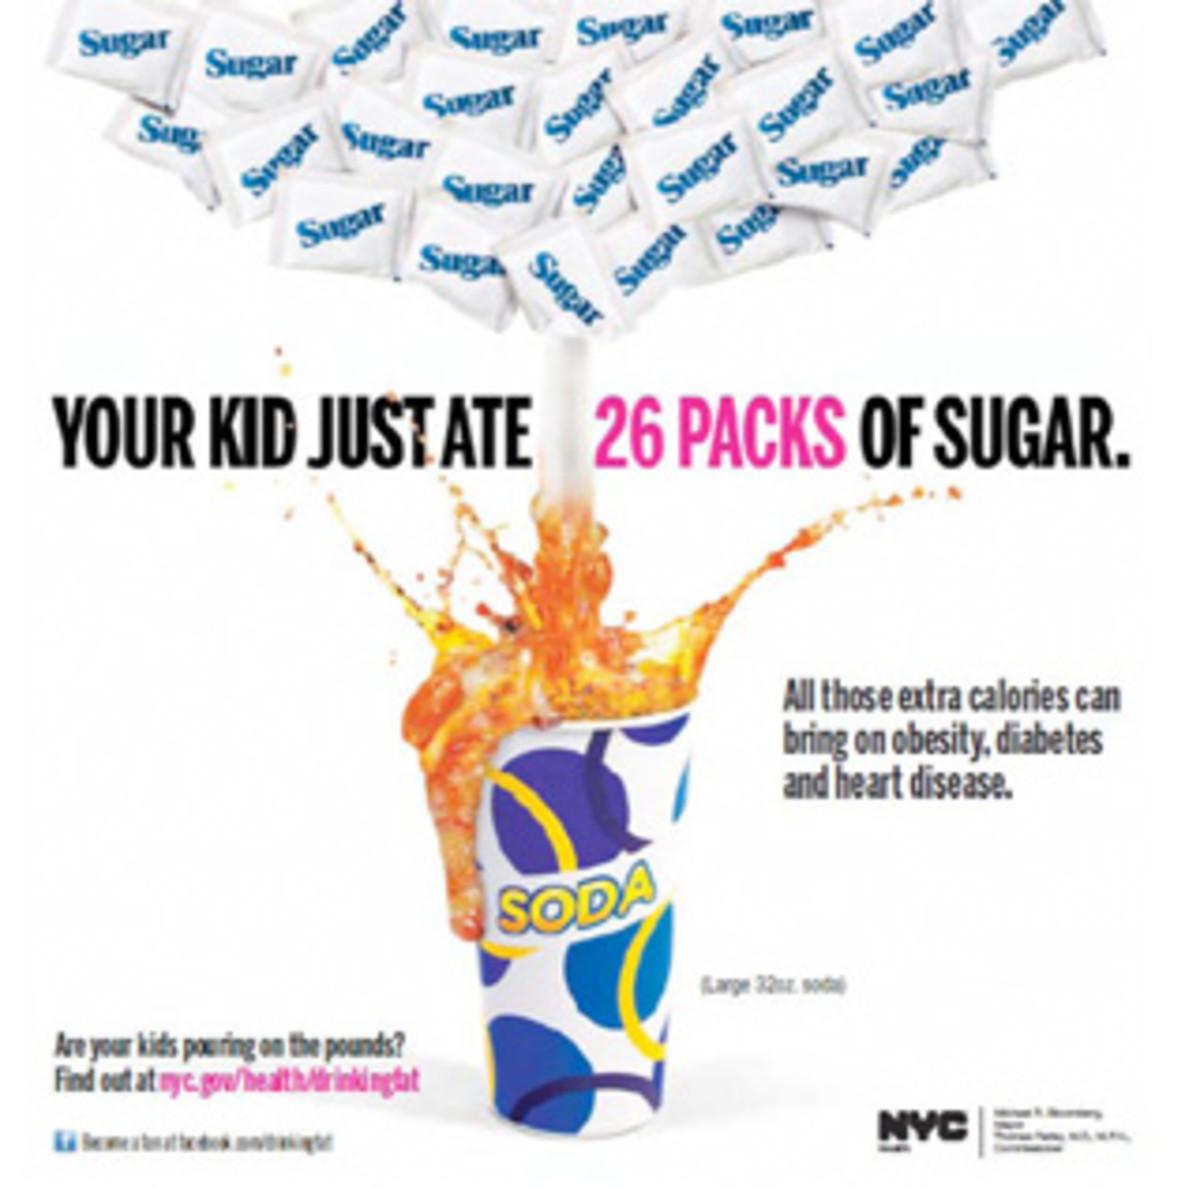 Calorie Poster - Sugar and Soda Pop